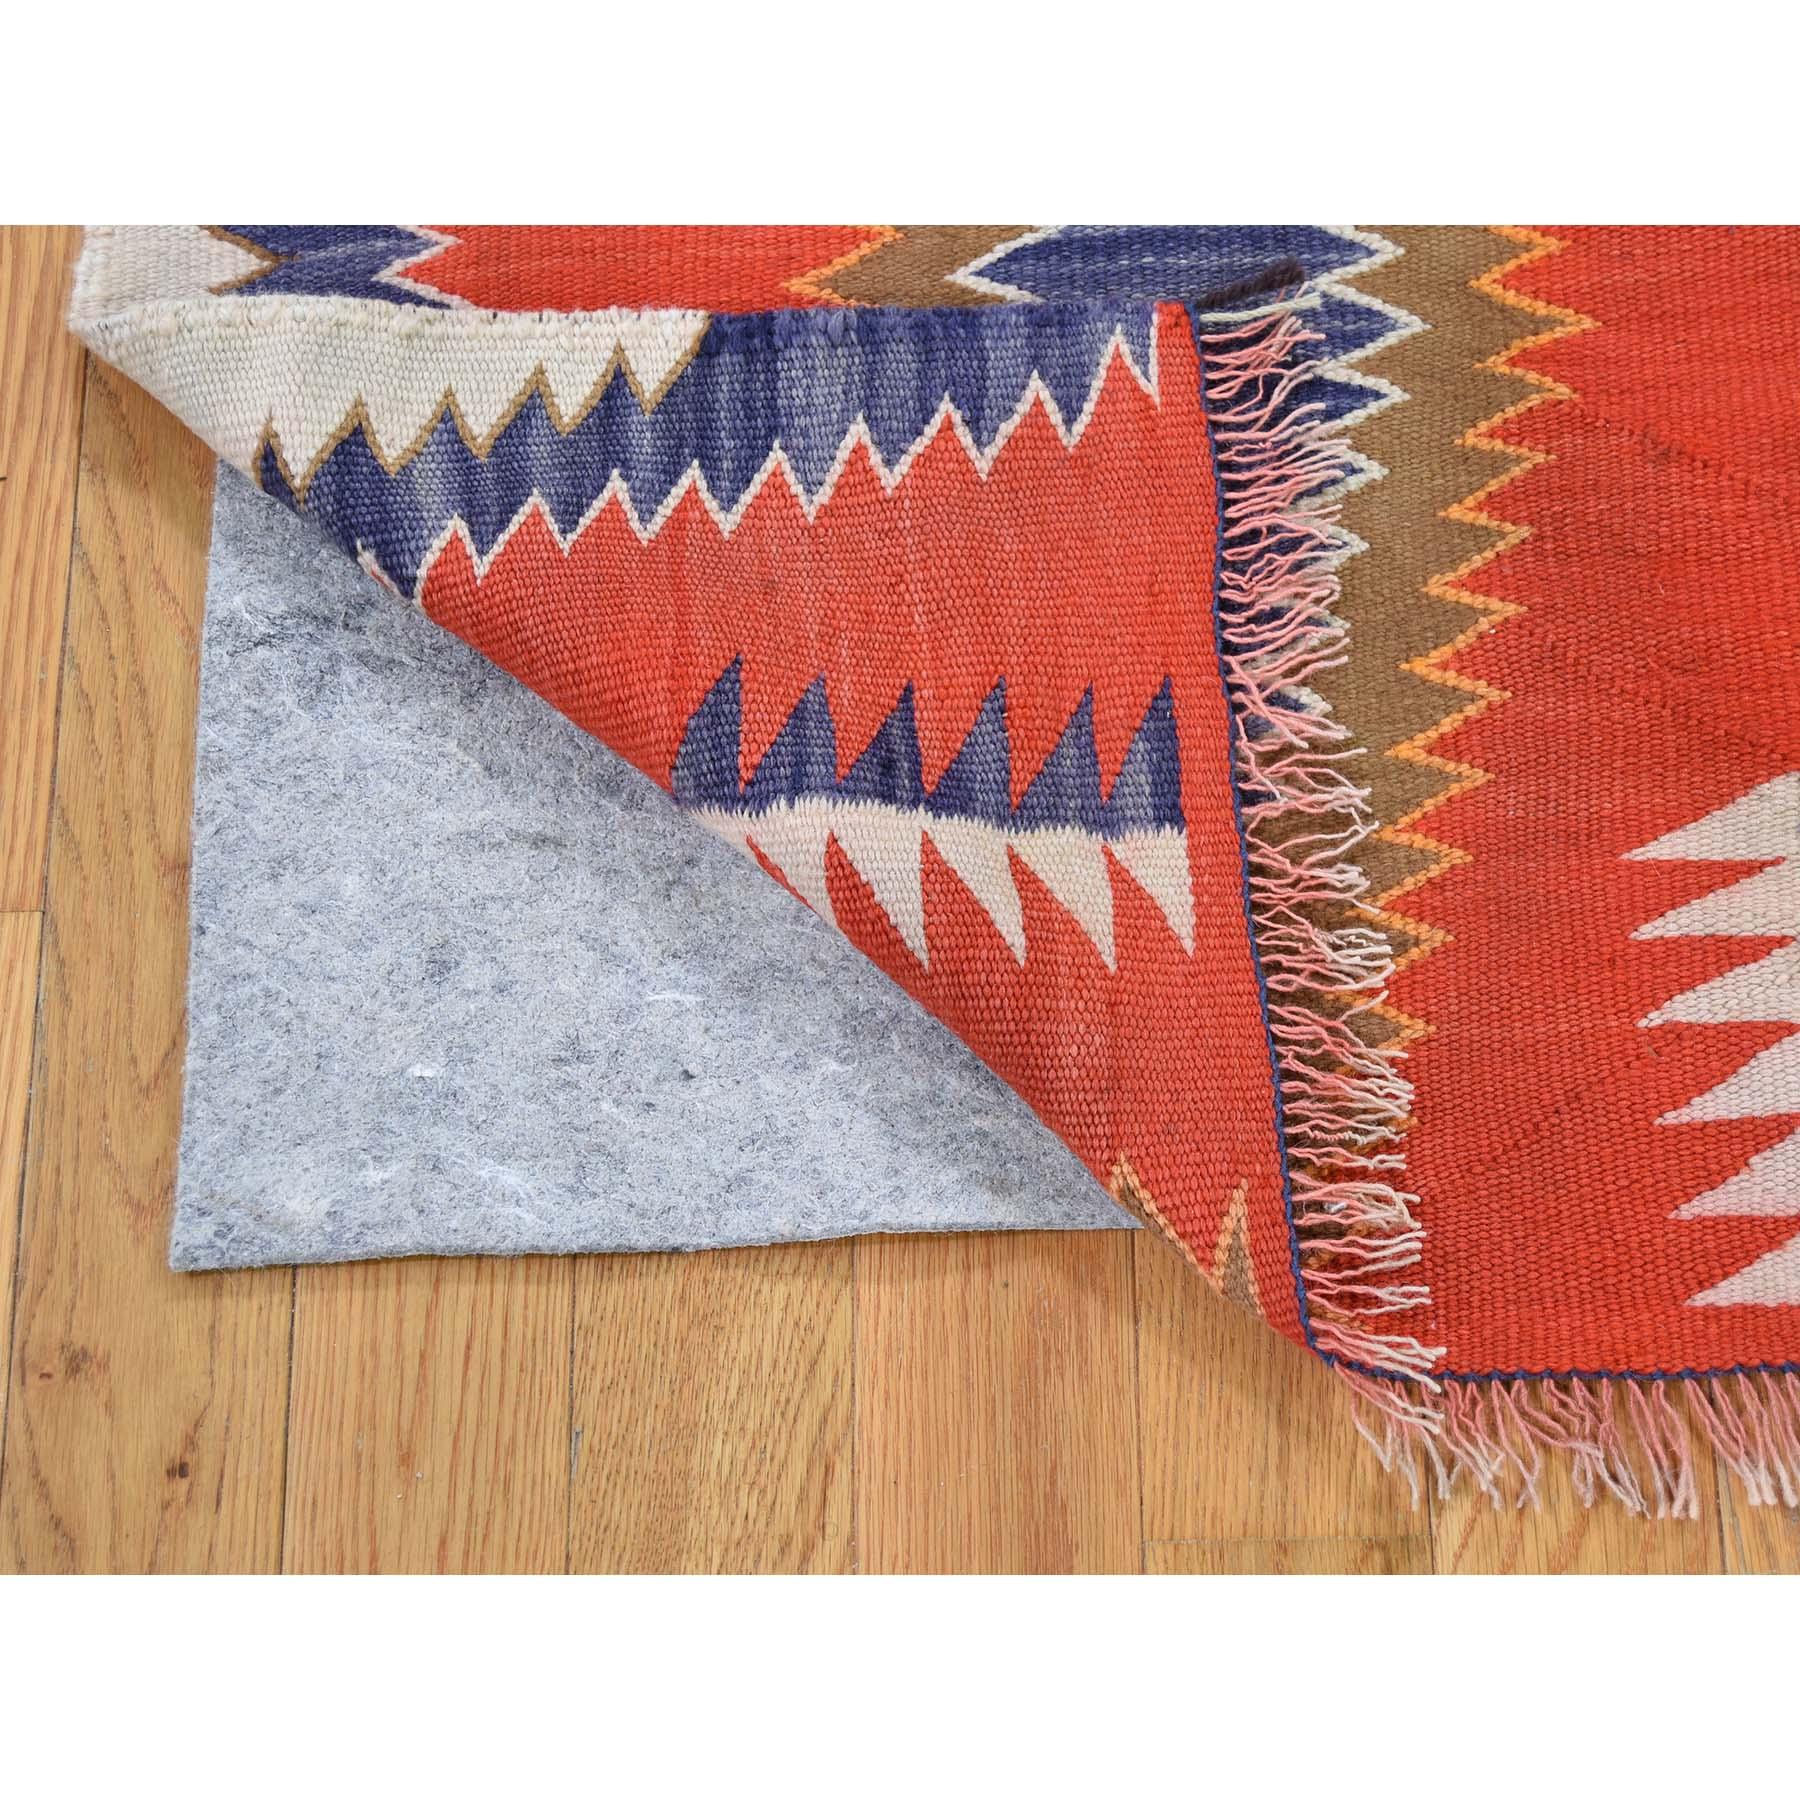 4-9 x6-5  Vintage American Indian Navajo Flat Weave Hand-Woven  Rug